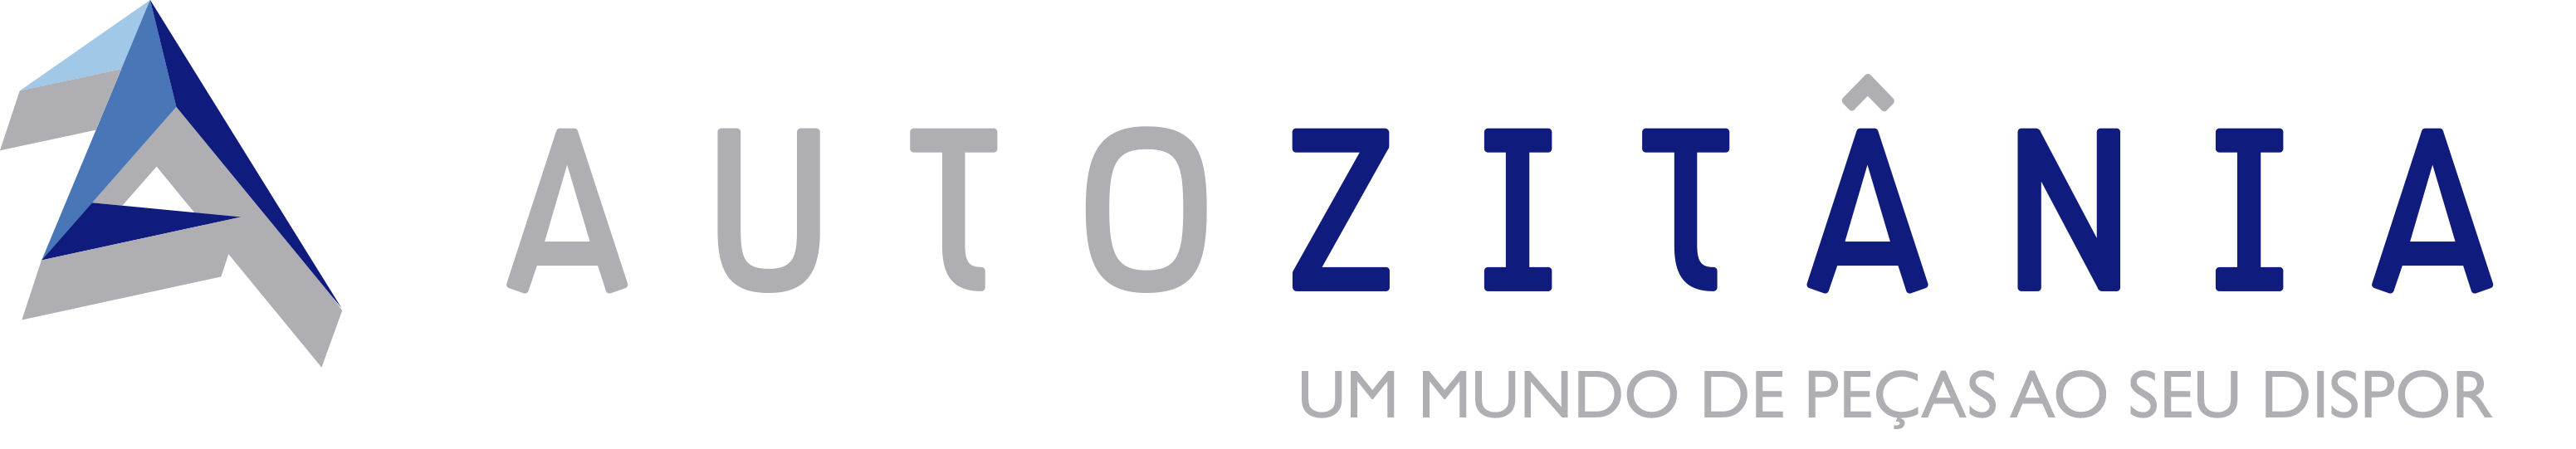 Logotipo-Autozitania_2018